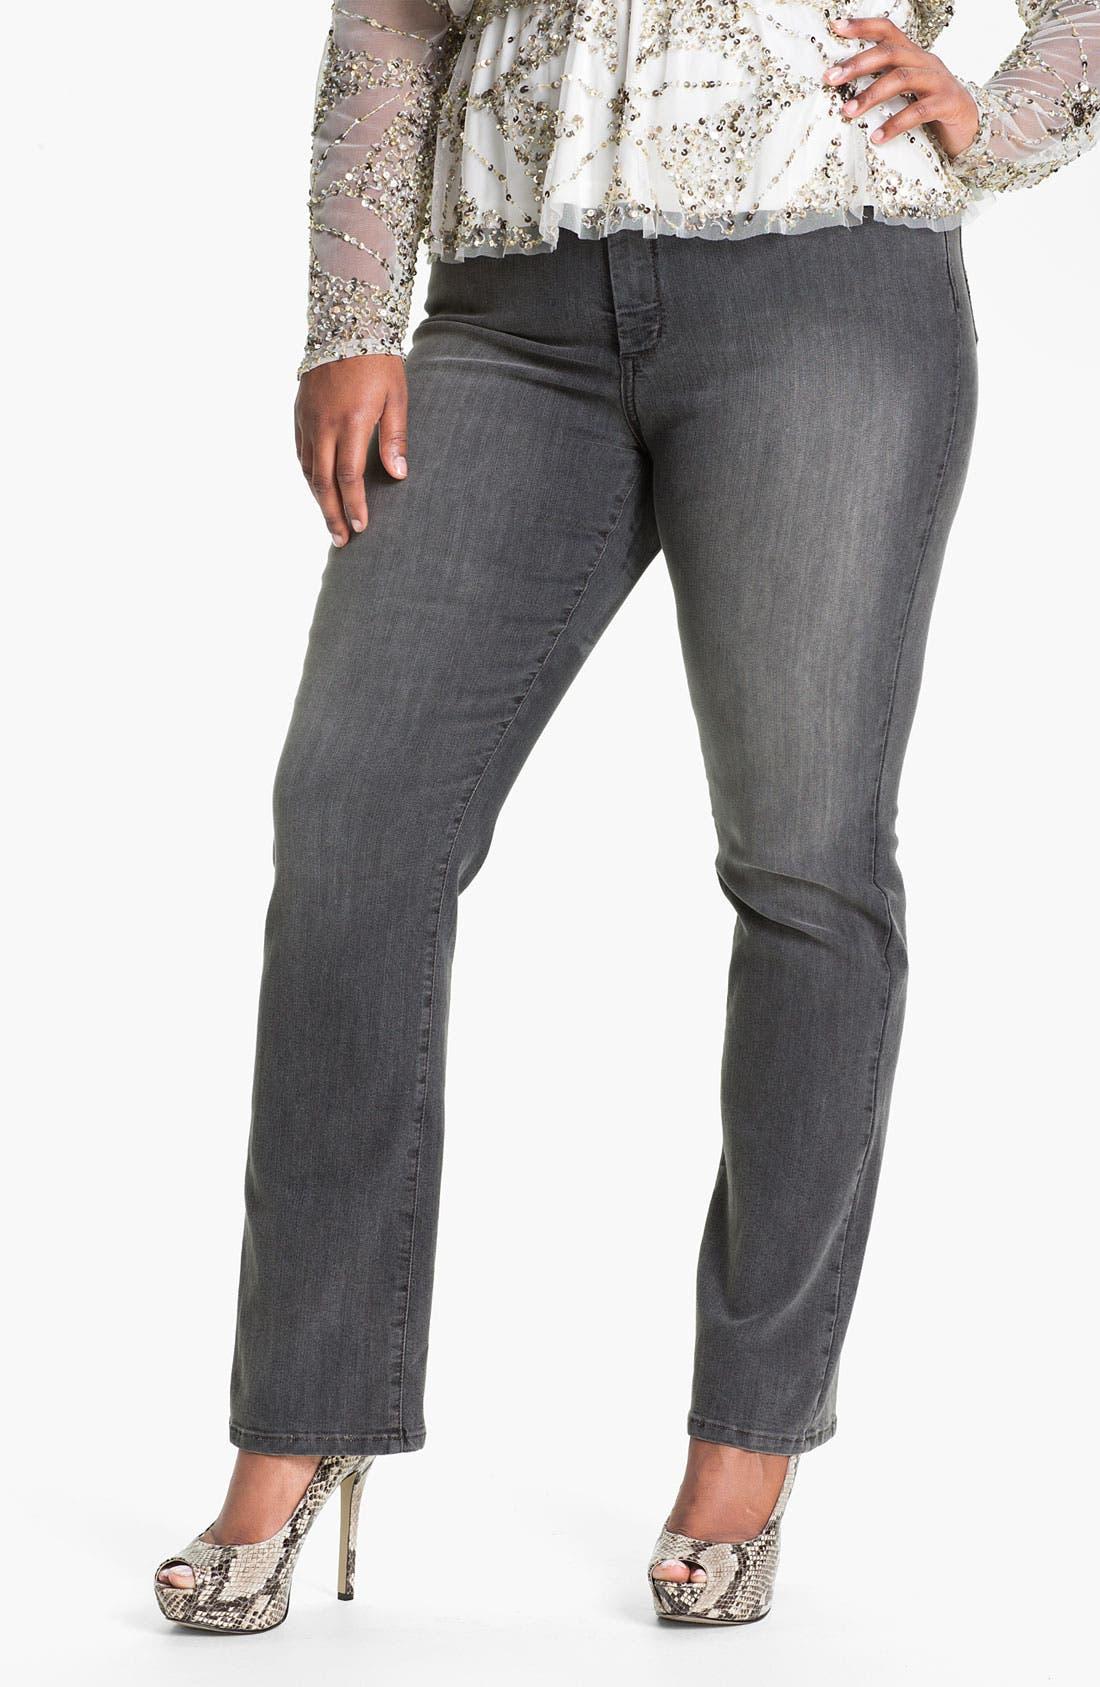 Alternate Image 1 Selected - NYDJ 'Marilyn' Straight Leg Stretch Jeans (Plus)